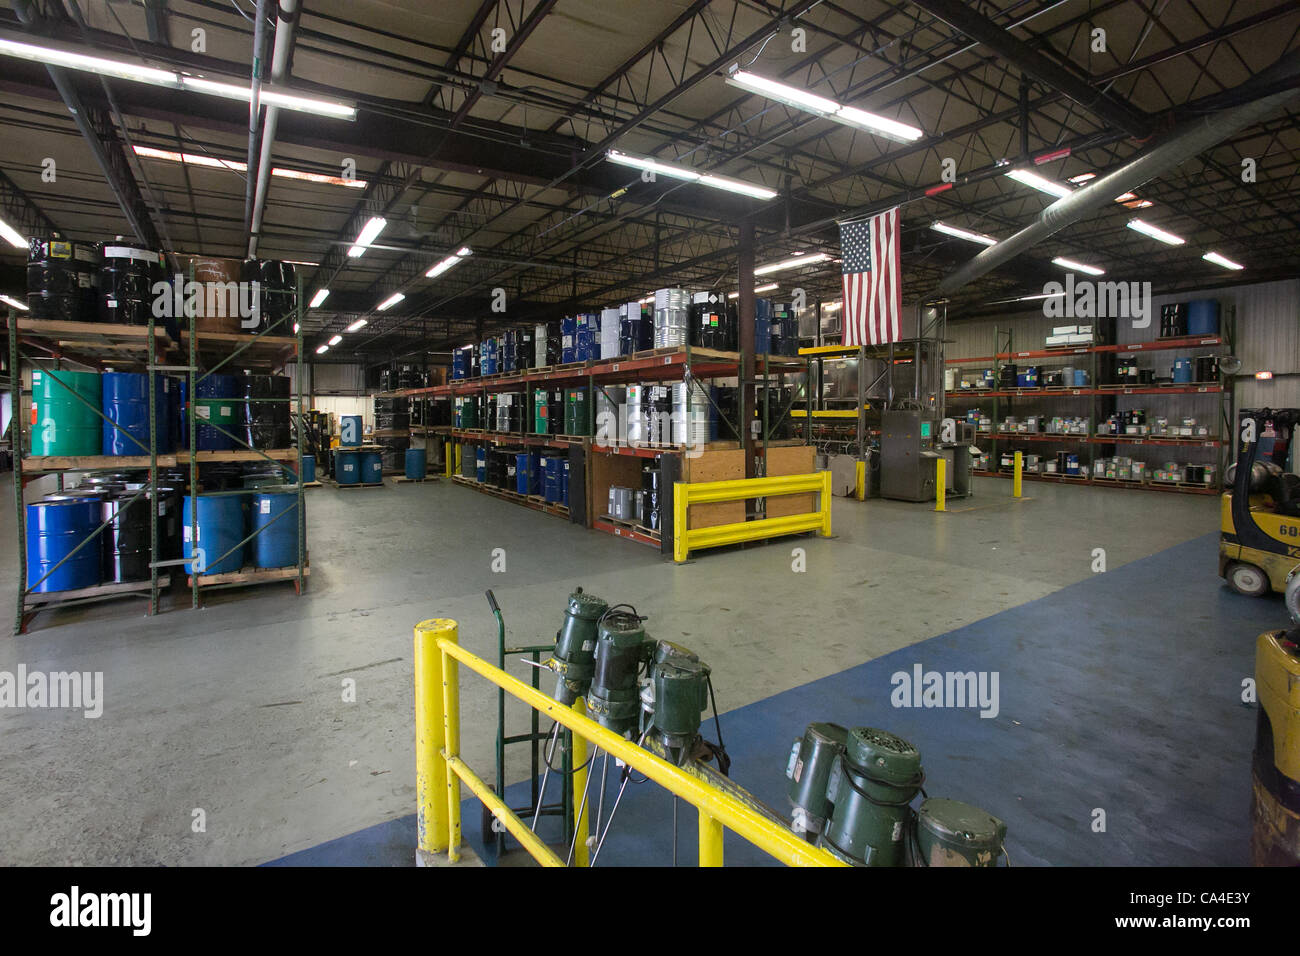 086 Jpg Stockfotos 086 Jpg Bilder Seite 3 Alamy